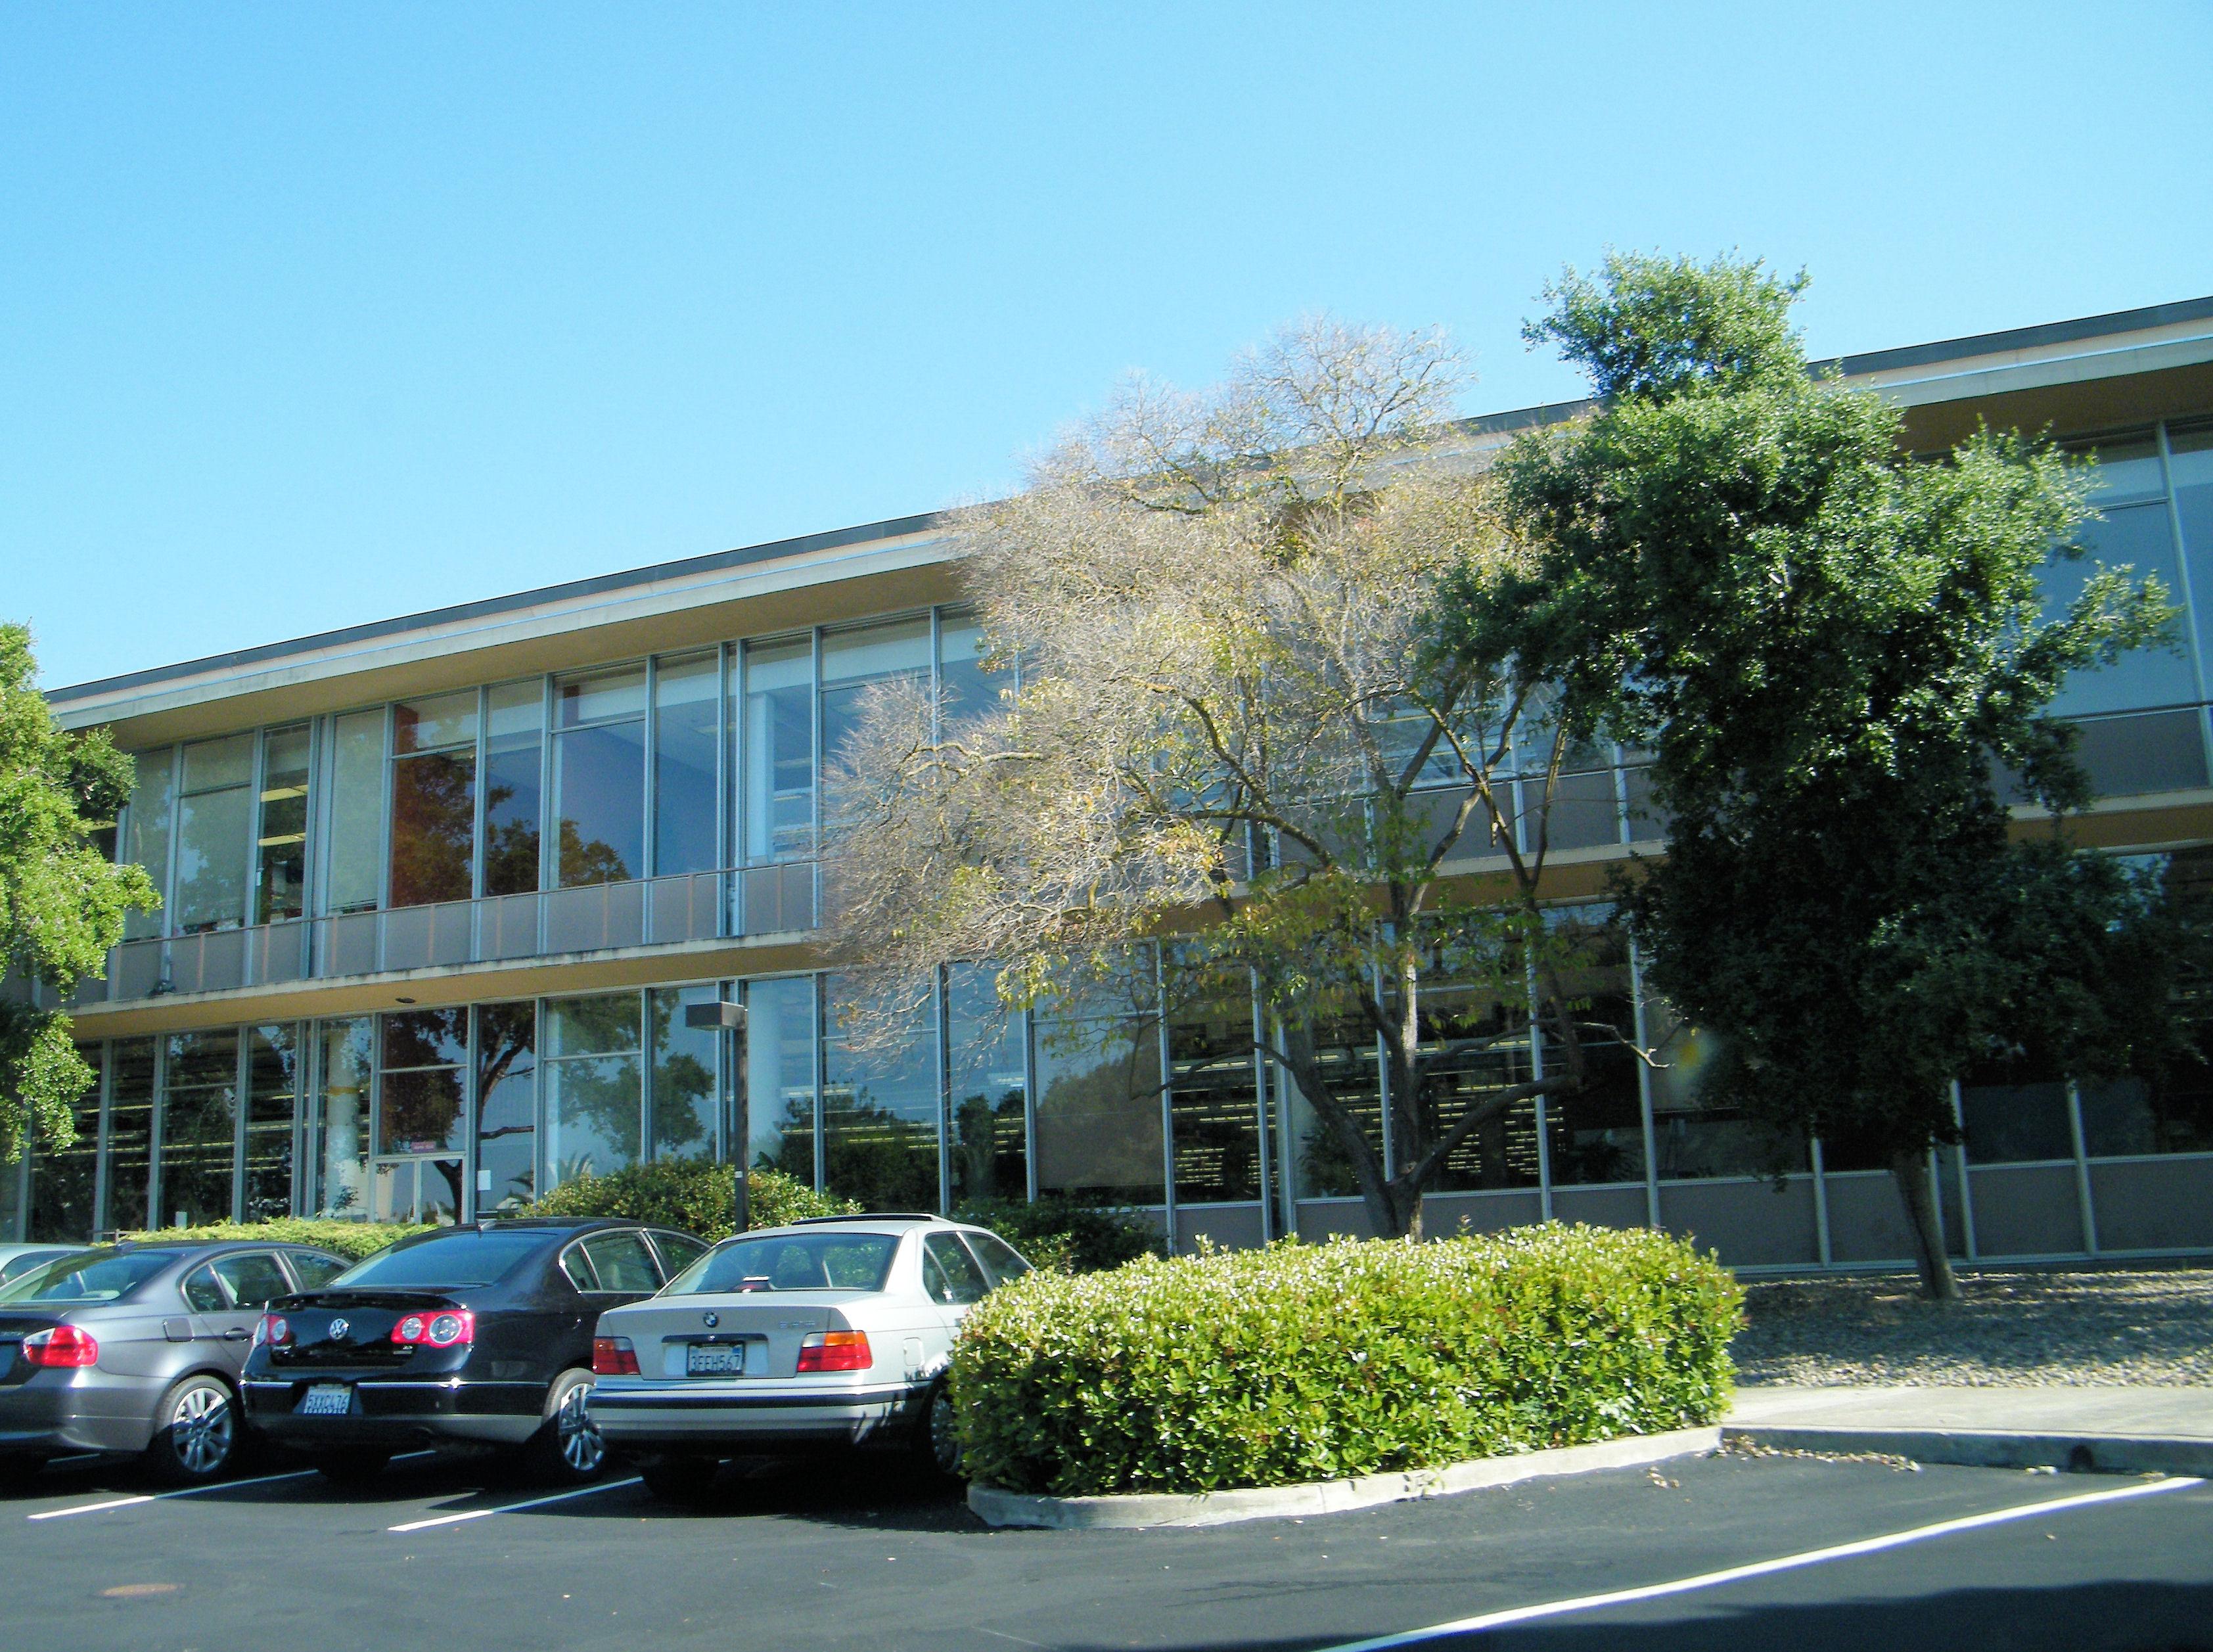 File:Facebook headquarters building.jpg - Wikimedia Commons